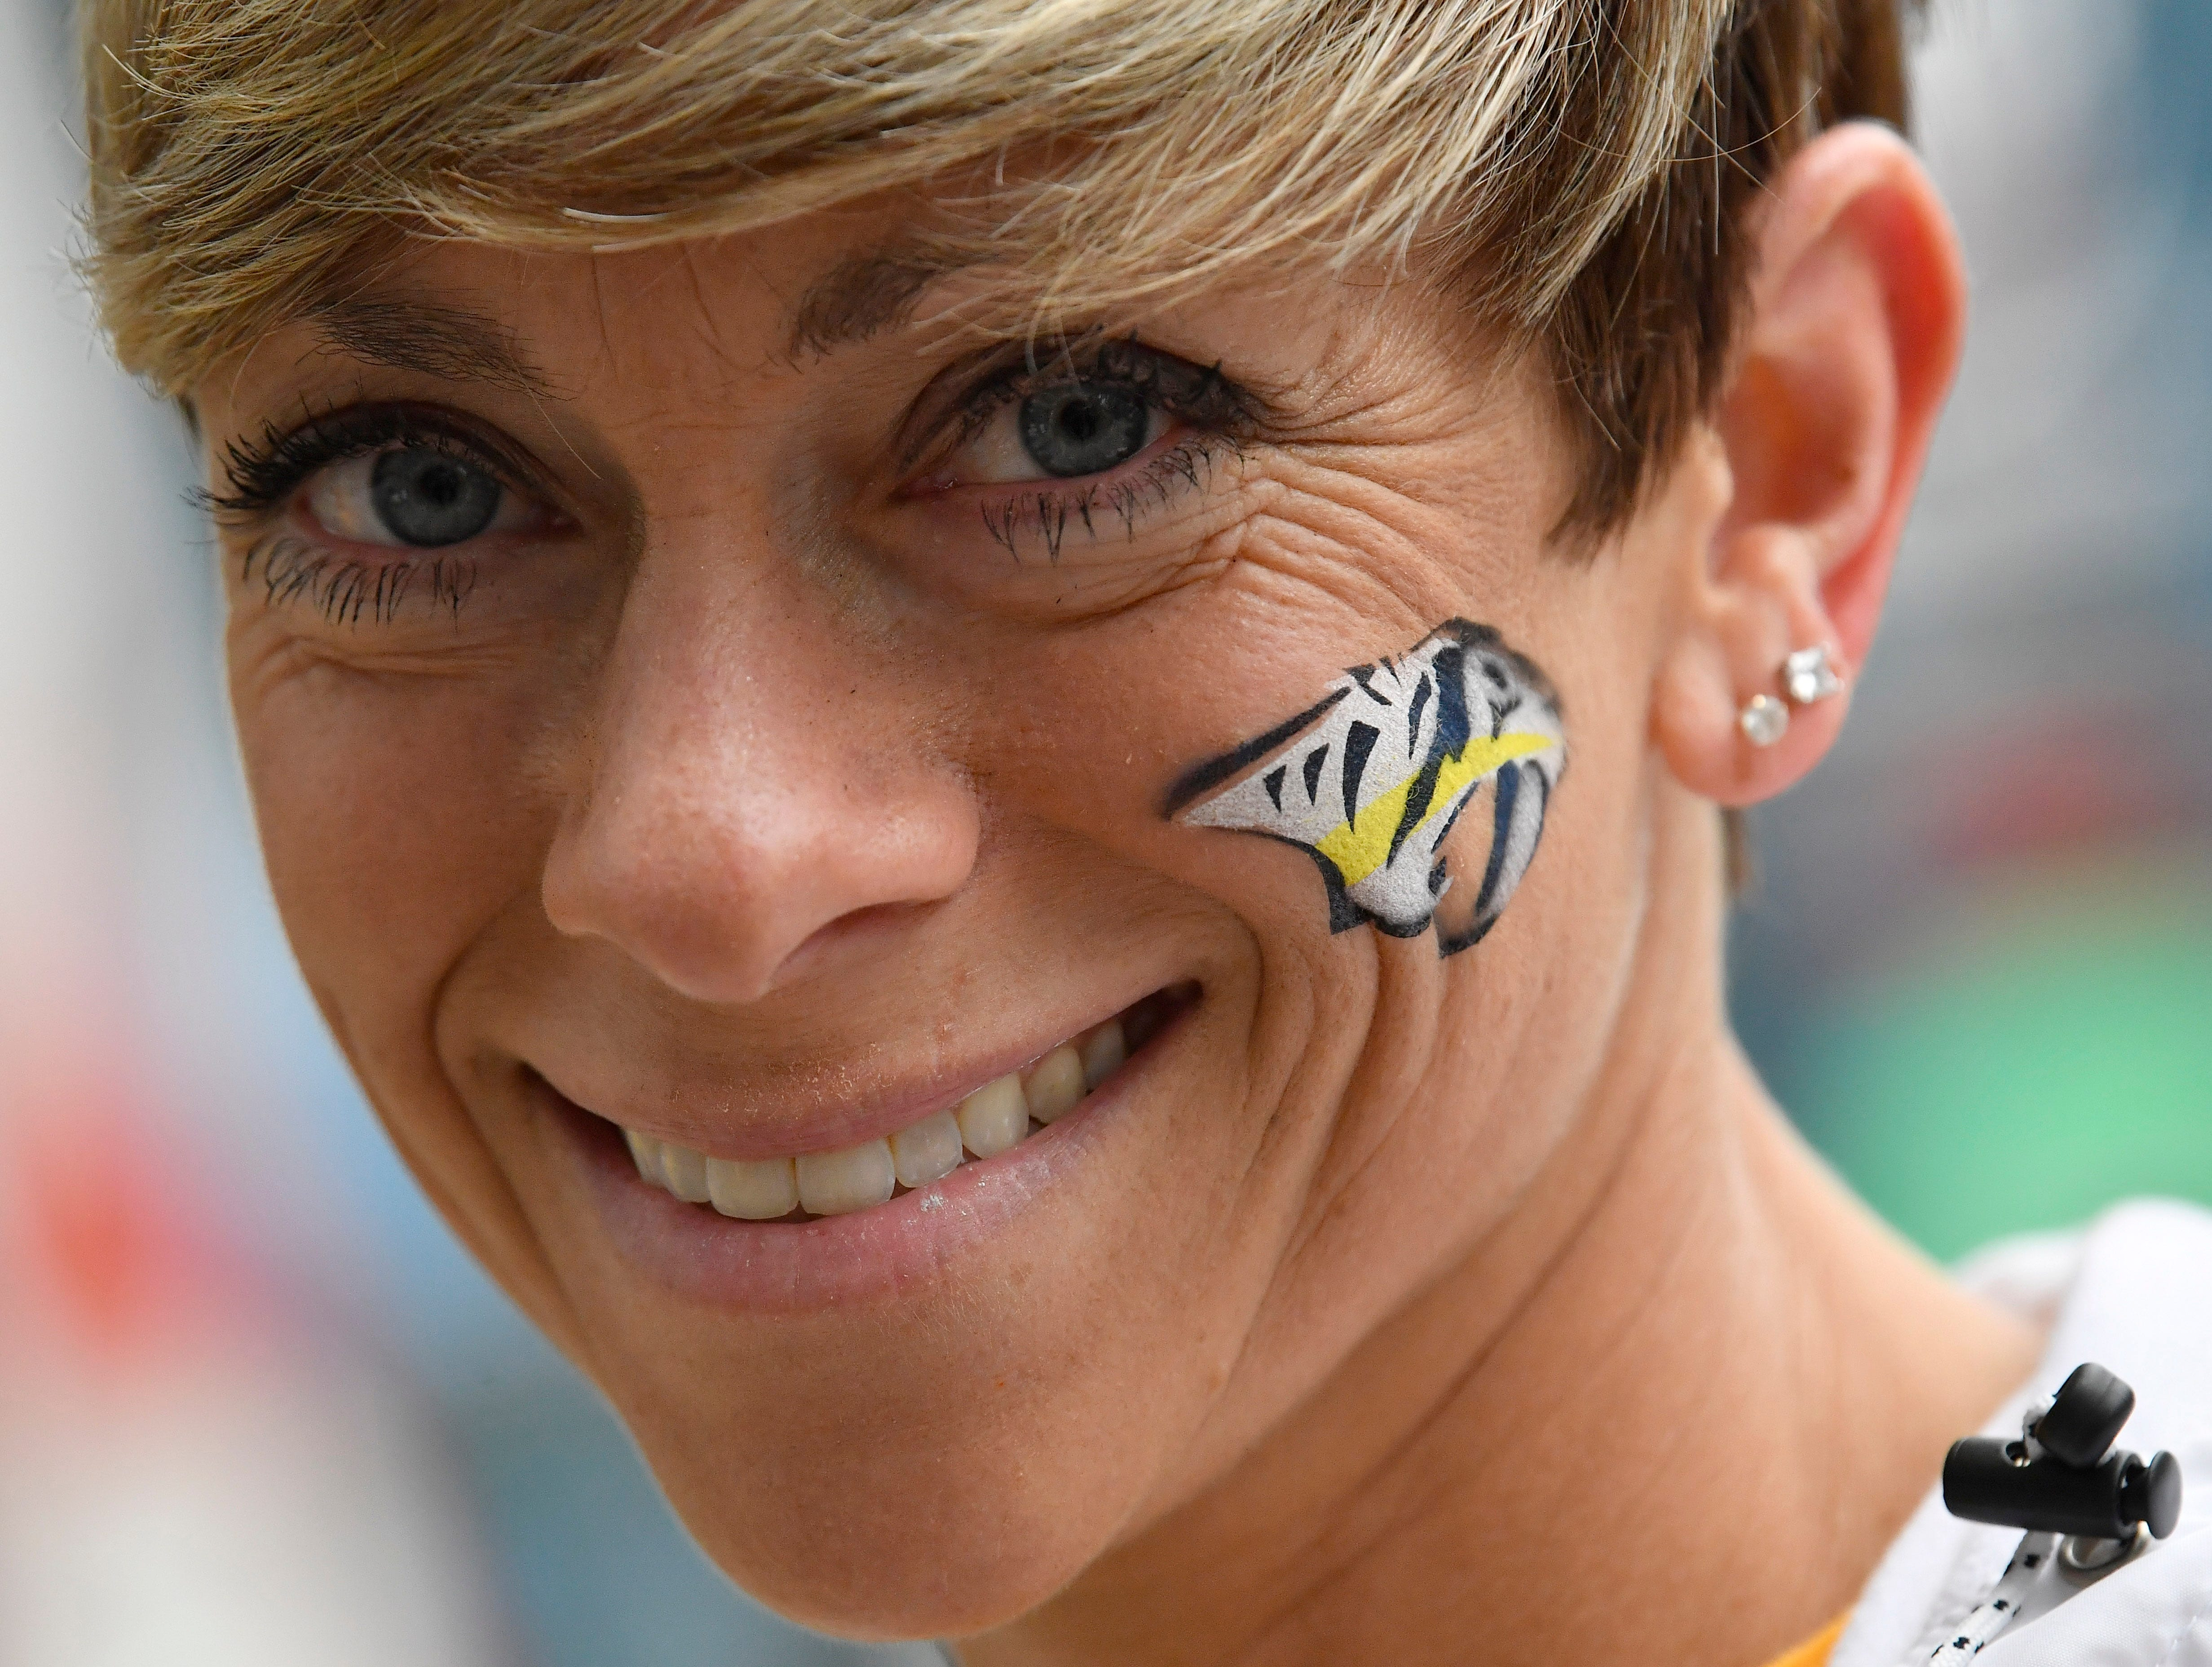 Angela Garton wears her Predators support on her face before the divisional semifinal game against Dallas at Bridgestone Arena in Nashville, Tenn., Saturday, April 13, 2019.